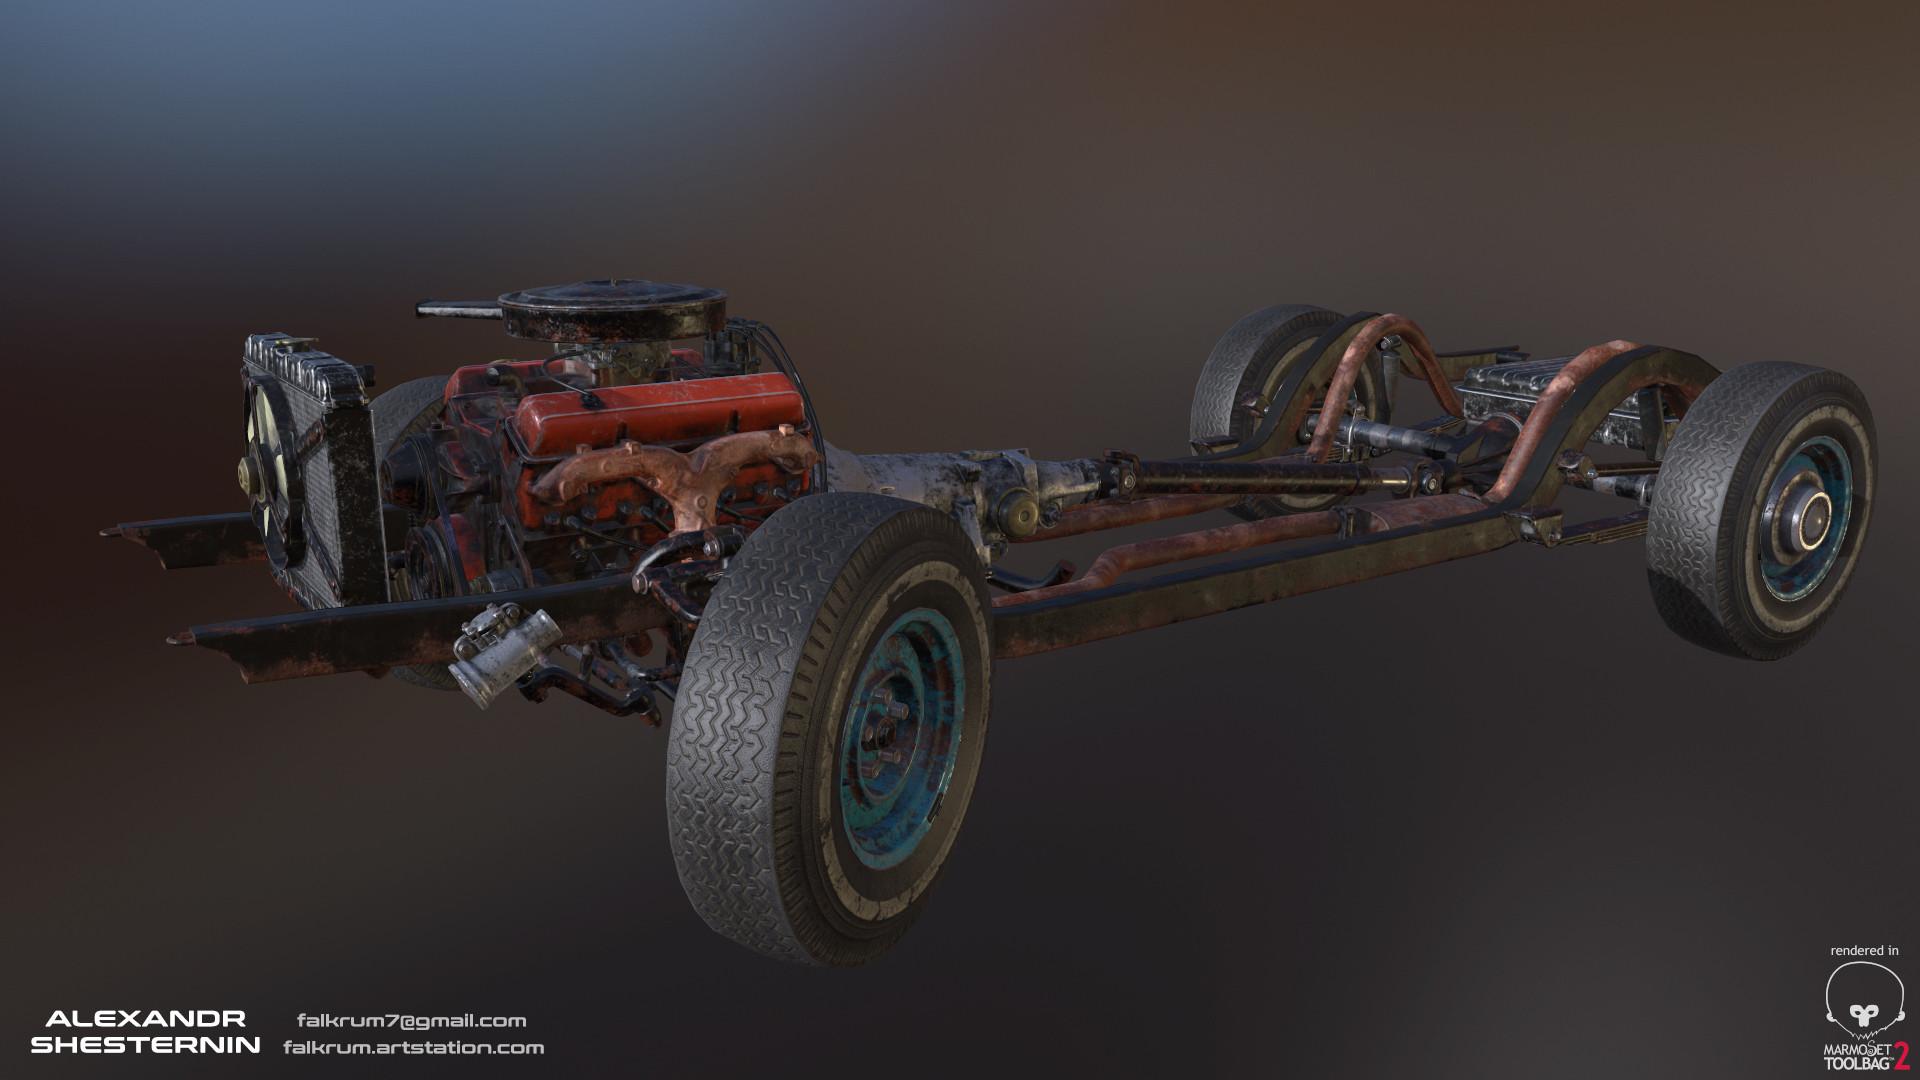 Alexandr shesternin modular abandoned car08